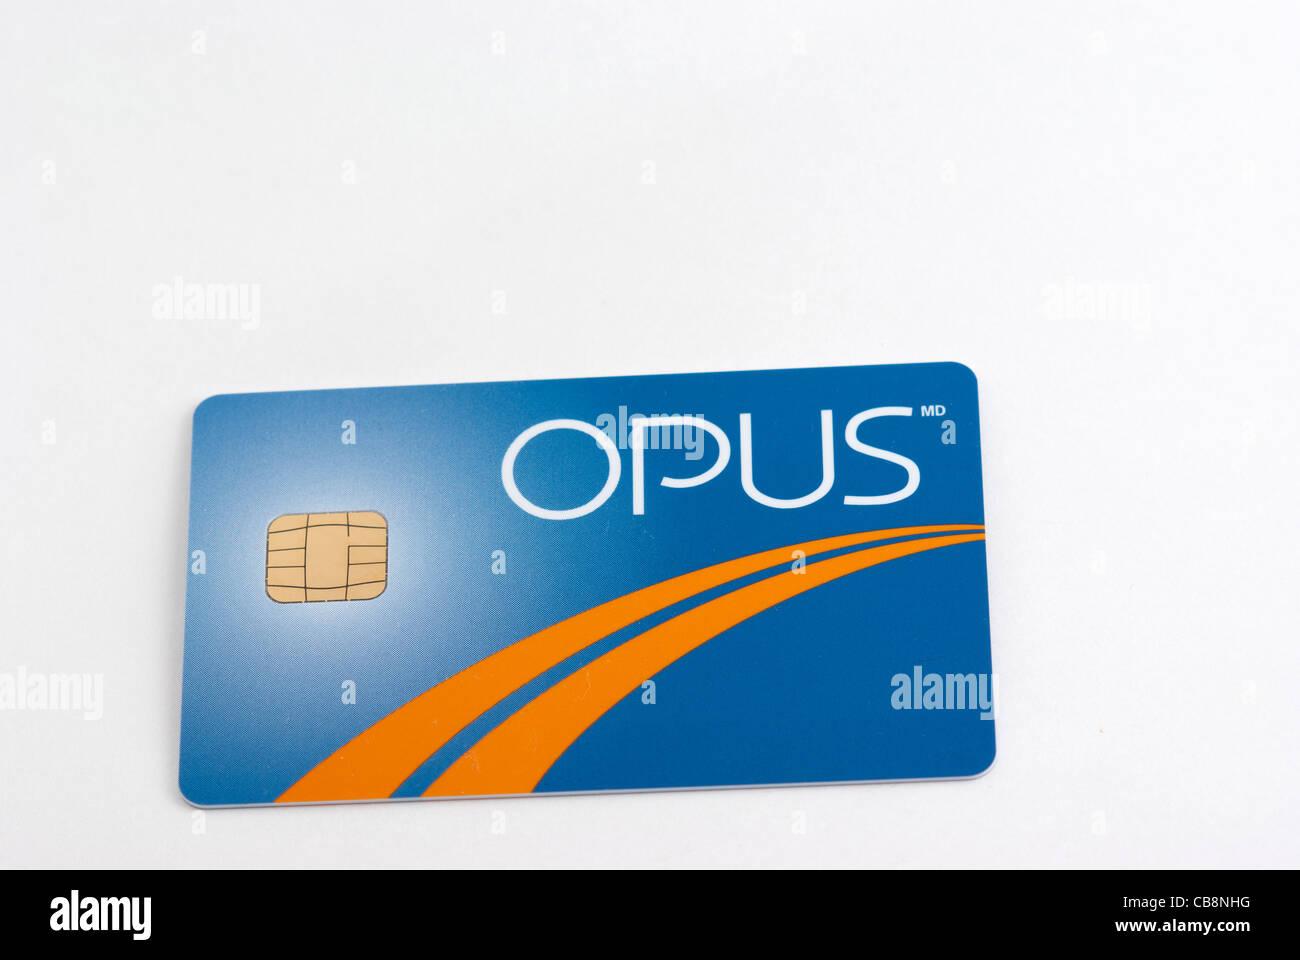 Carte Opus Montreal.Carte Opus De Transports Publics De Montreal Quebec Canada